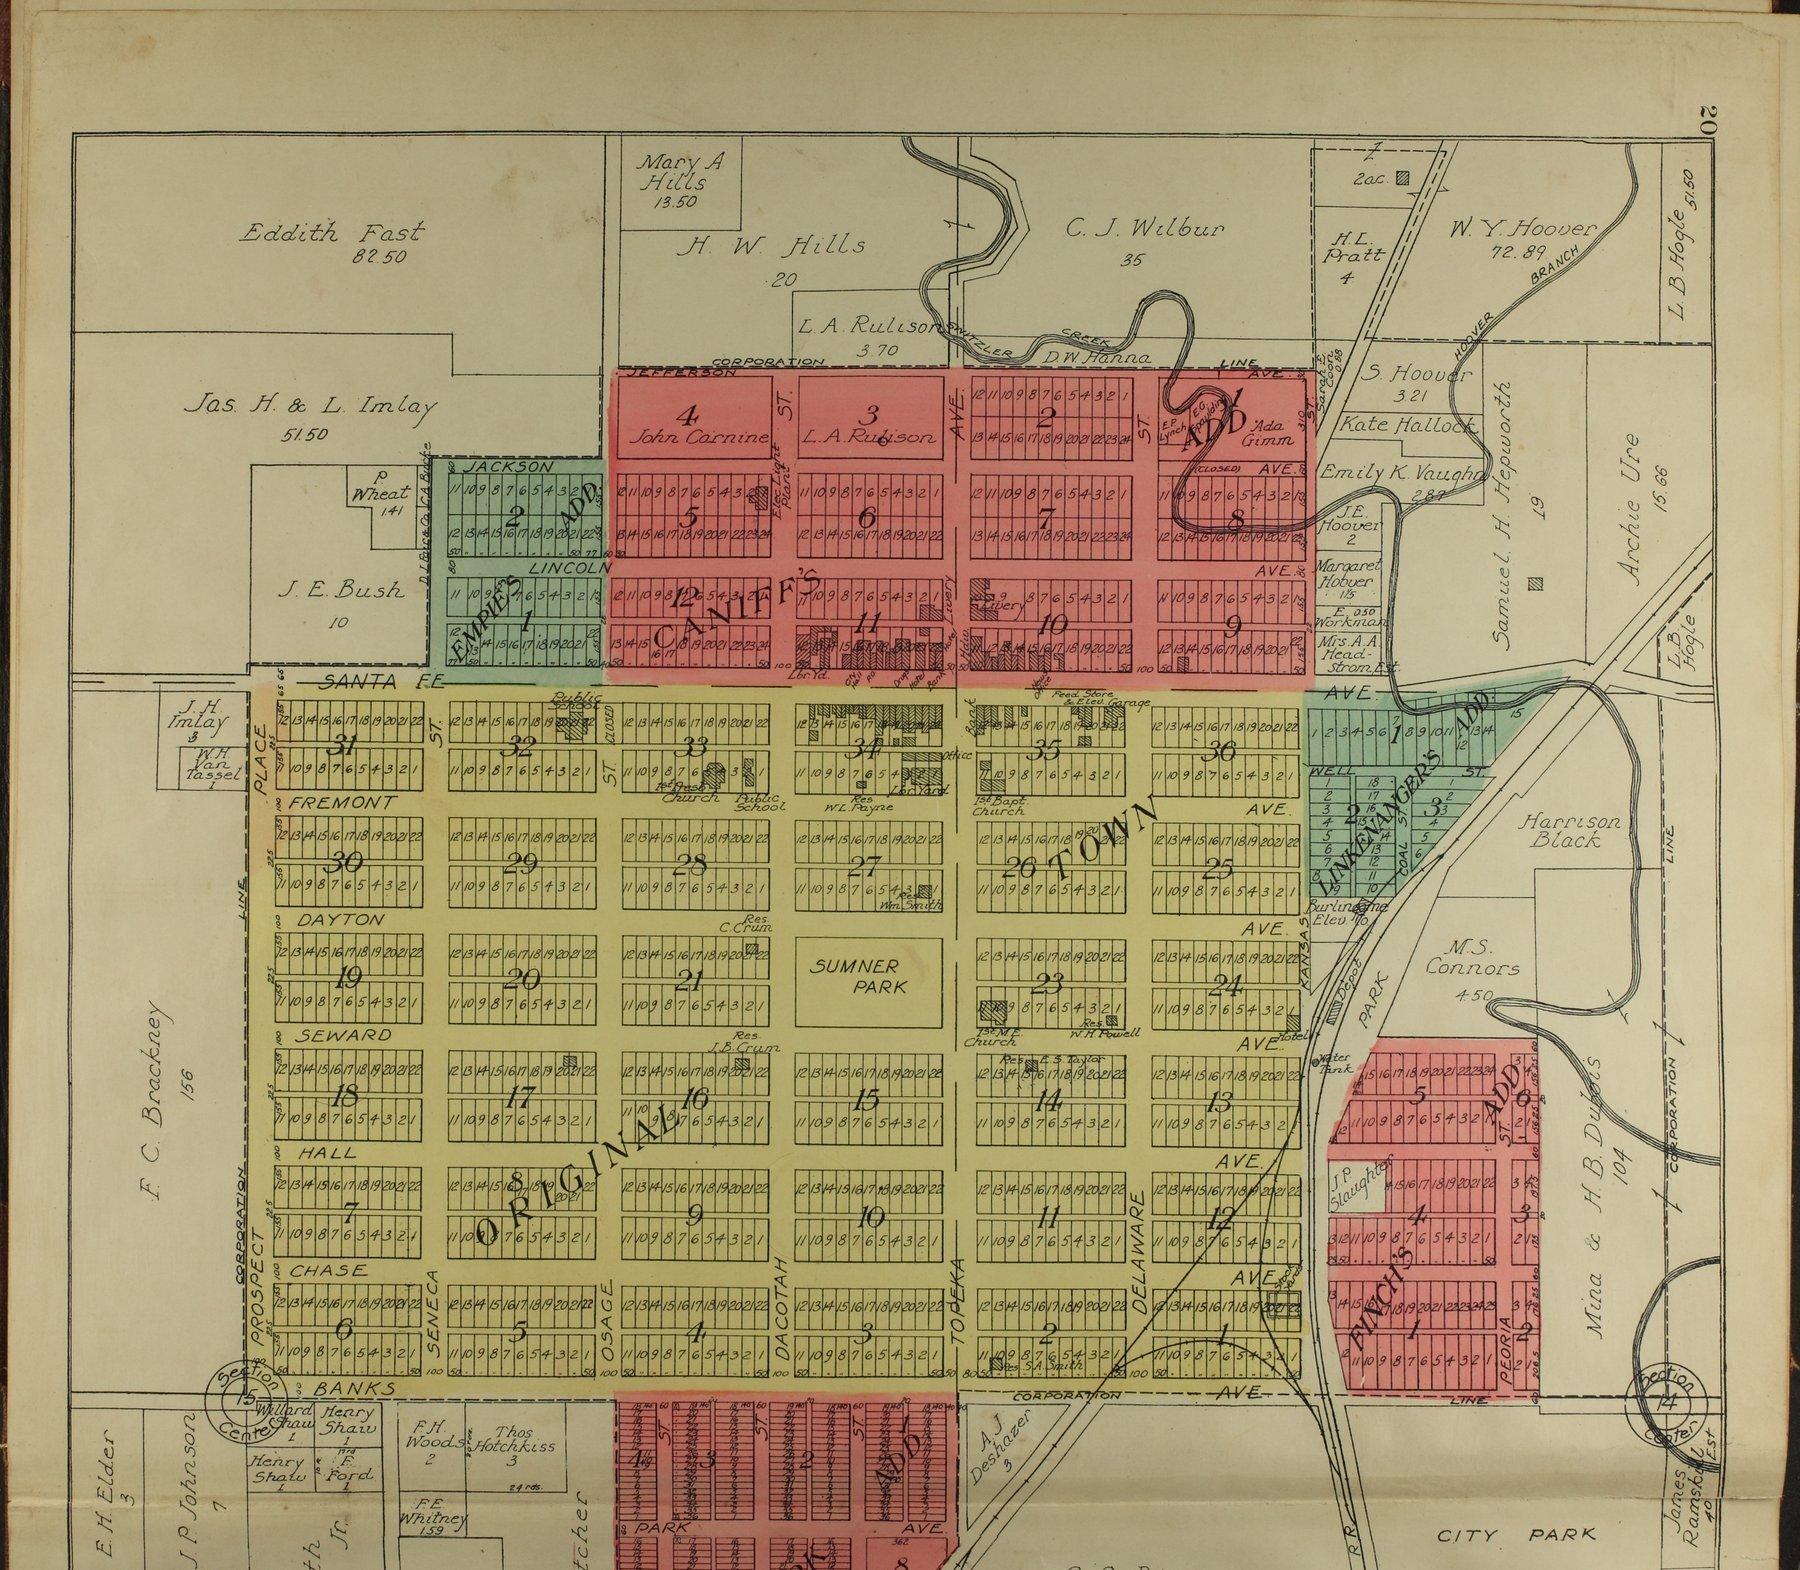 Standard atlas of Osage County, Kansas - 20